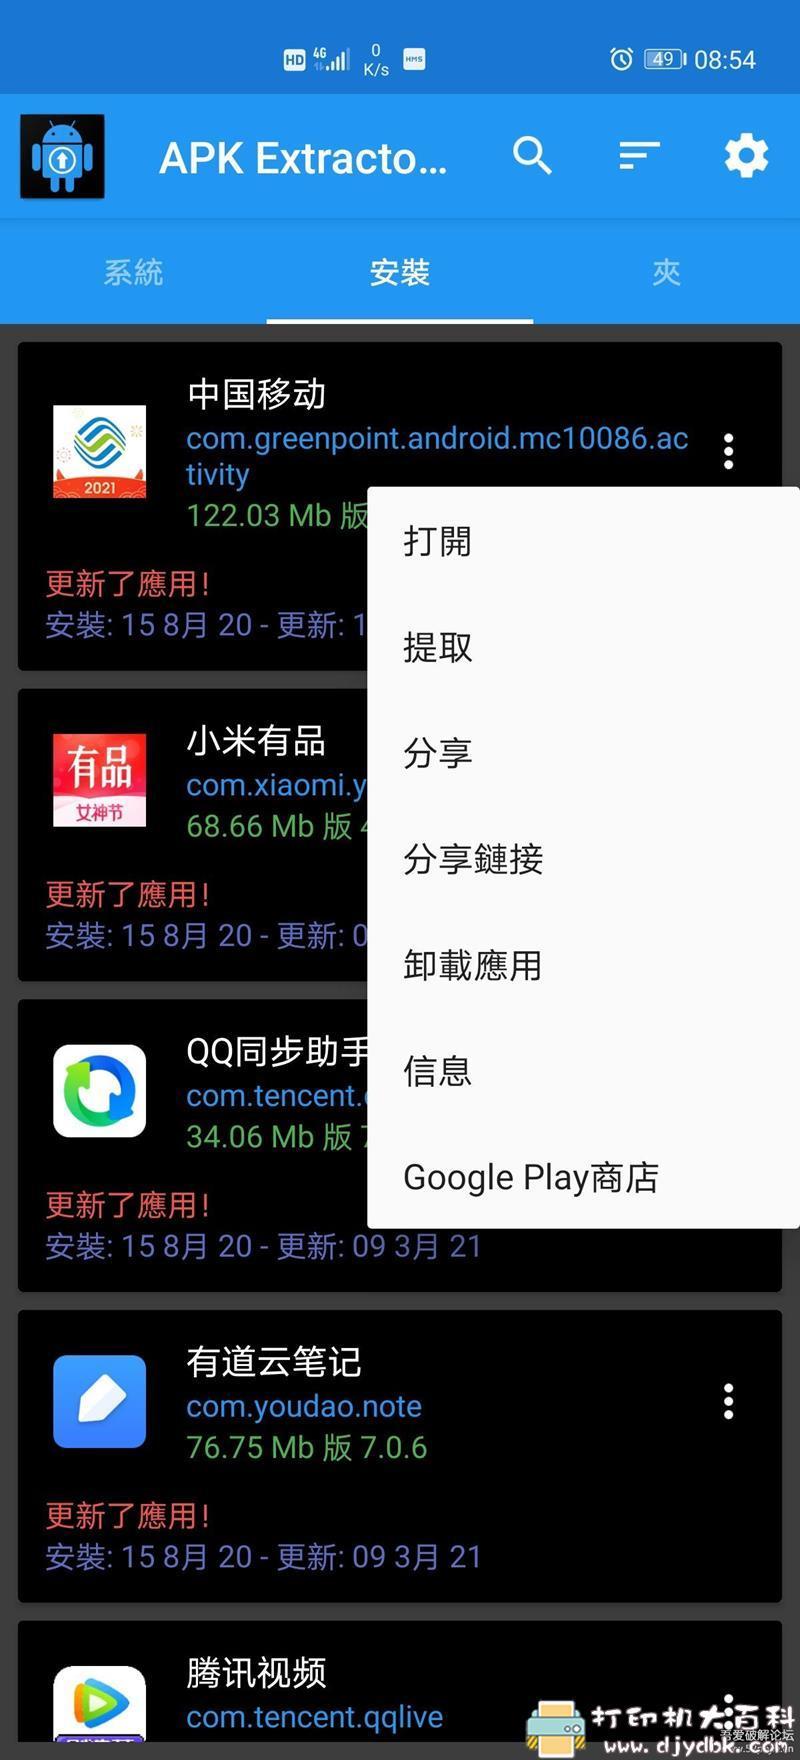 [Android]APK Extractor Pro「APK提取器」 v14.5.0去广告专业版 配图 No.2